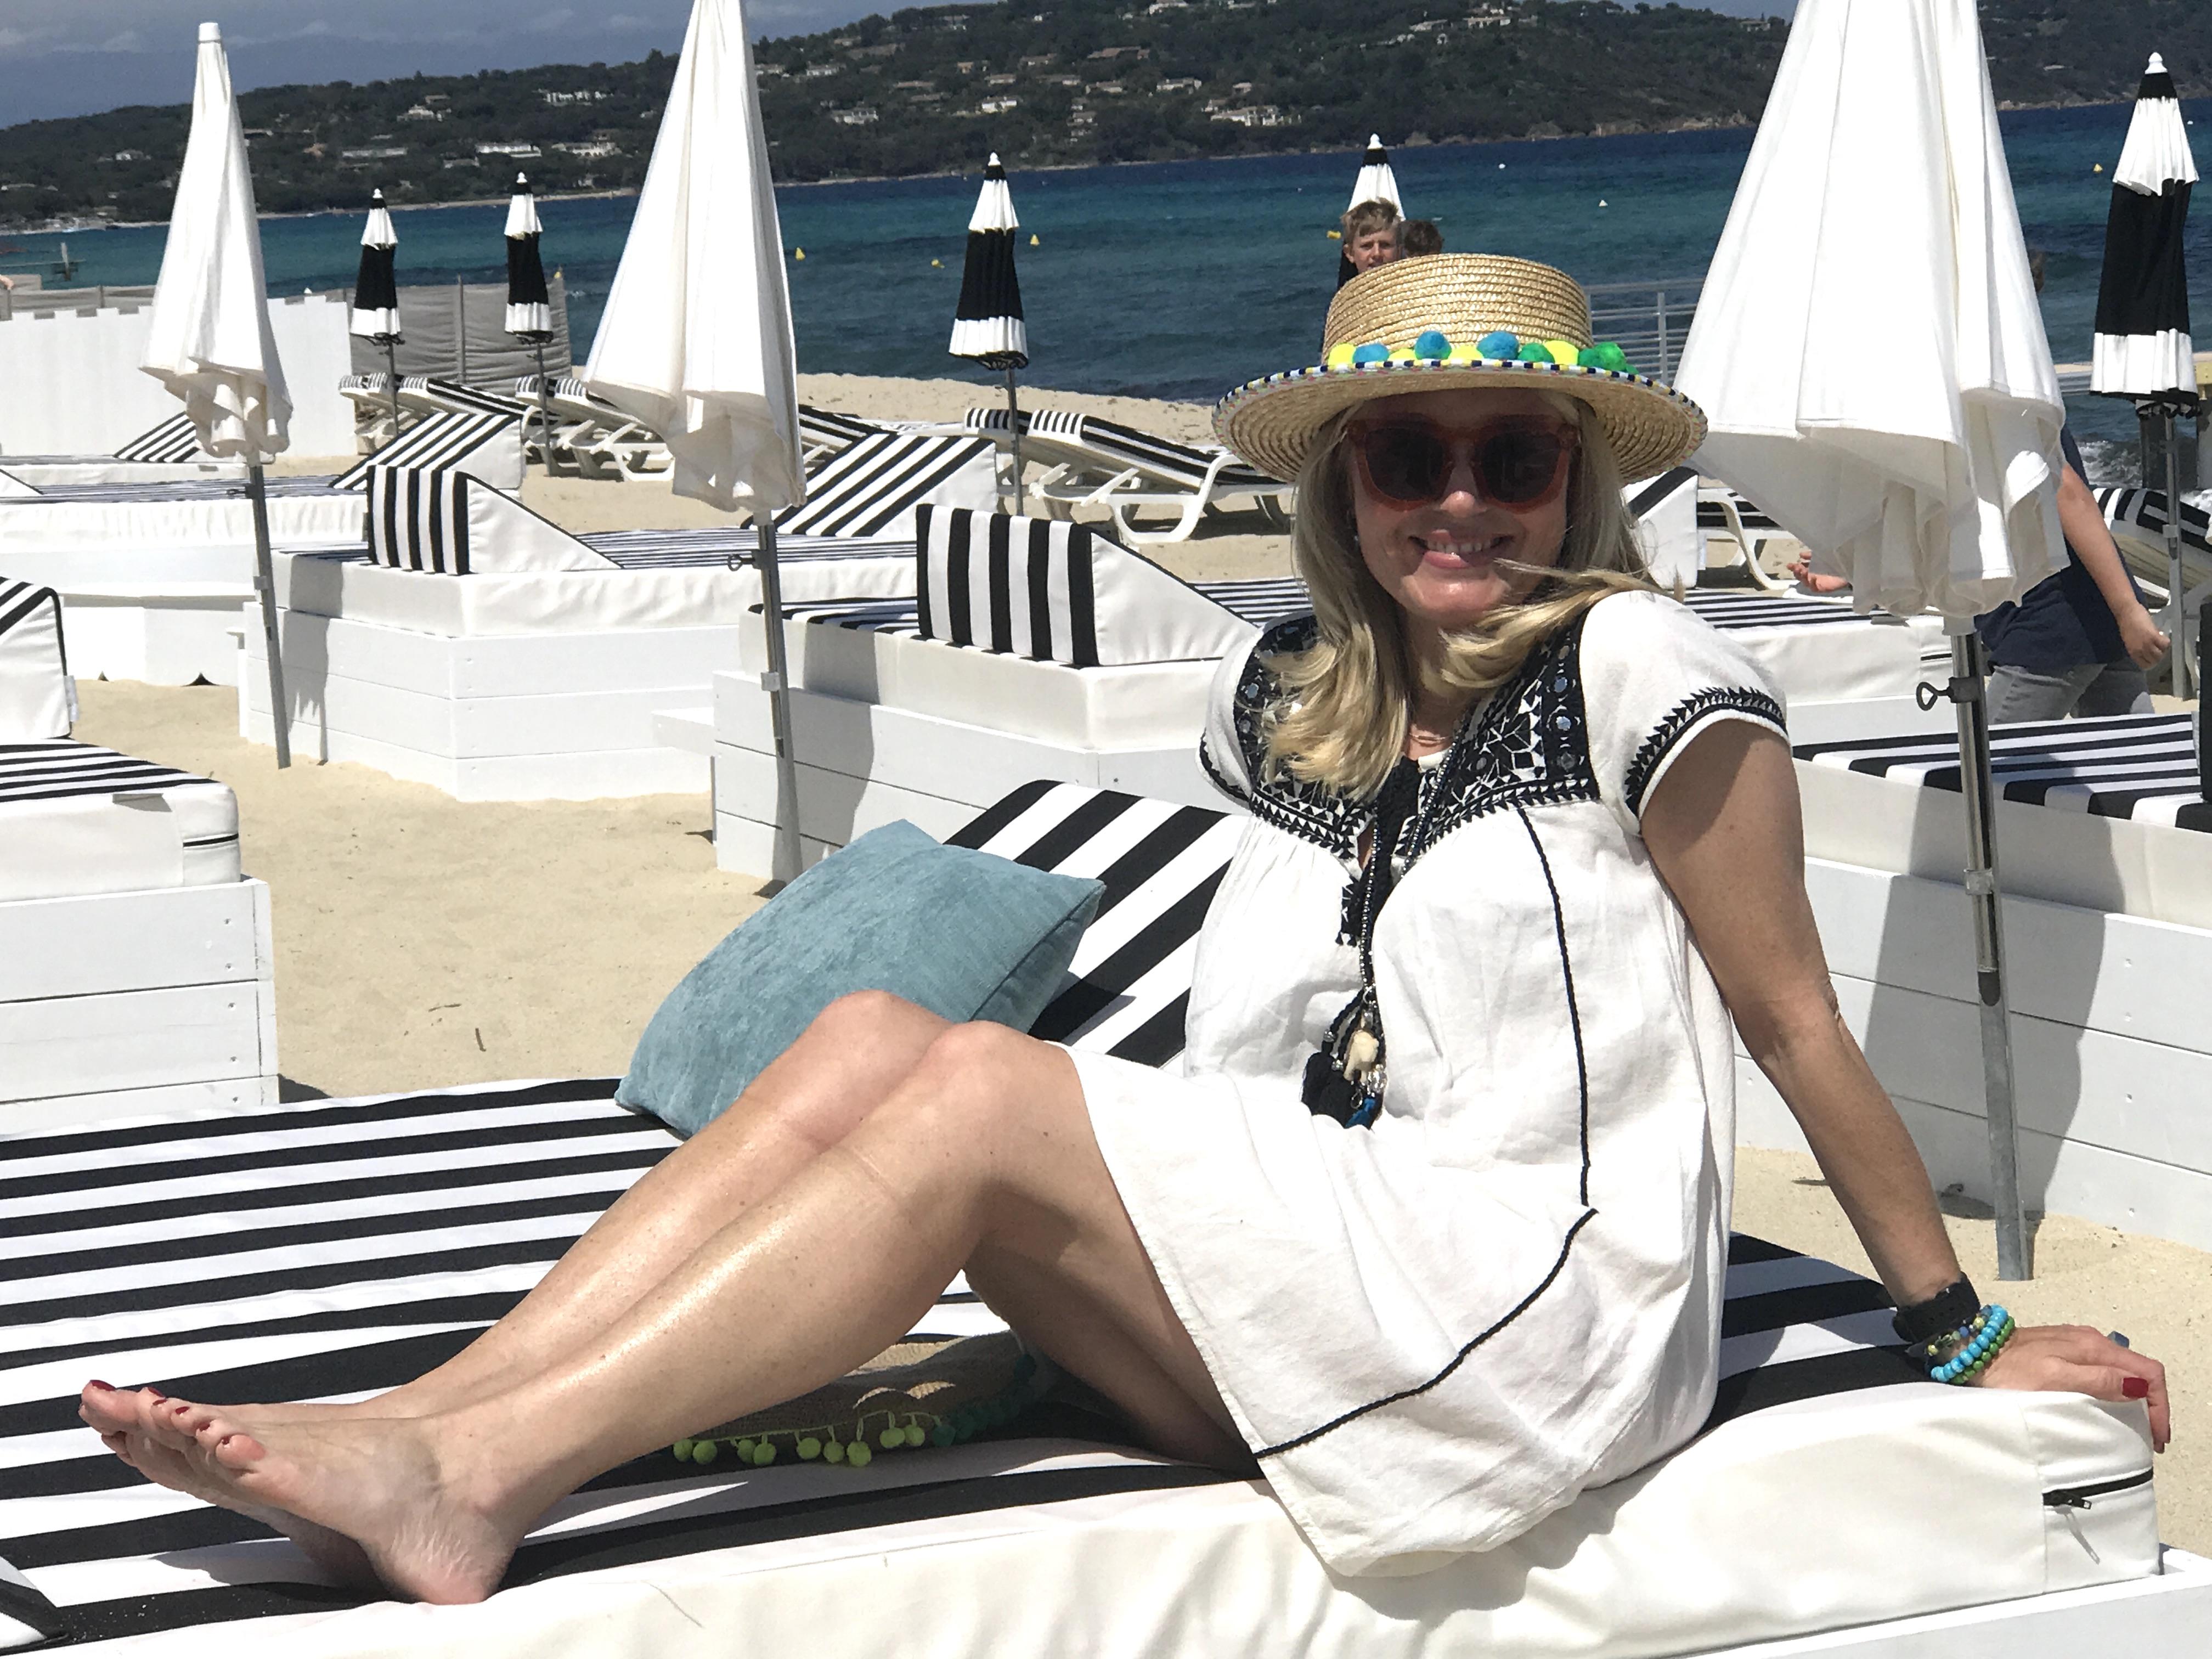 Sonnenhut Trend, Strohut Trends, Huttrends, Boater Loevenich, bunter Hut mit Bömmeln, Star Mela Tunika, Fashion-Blog, Lieblingsstil.,